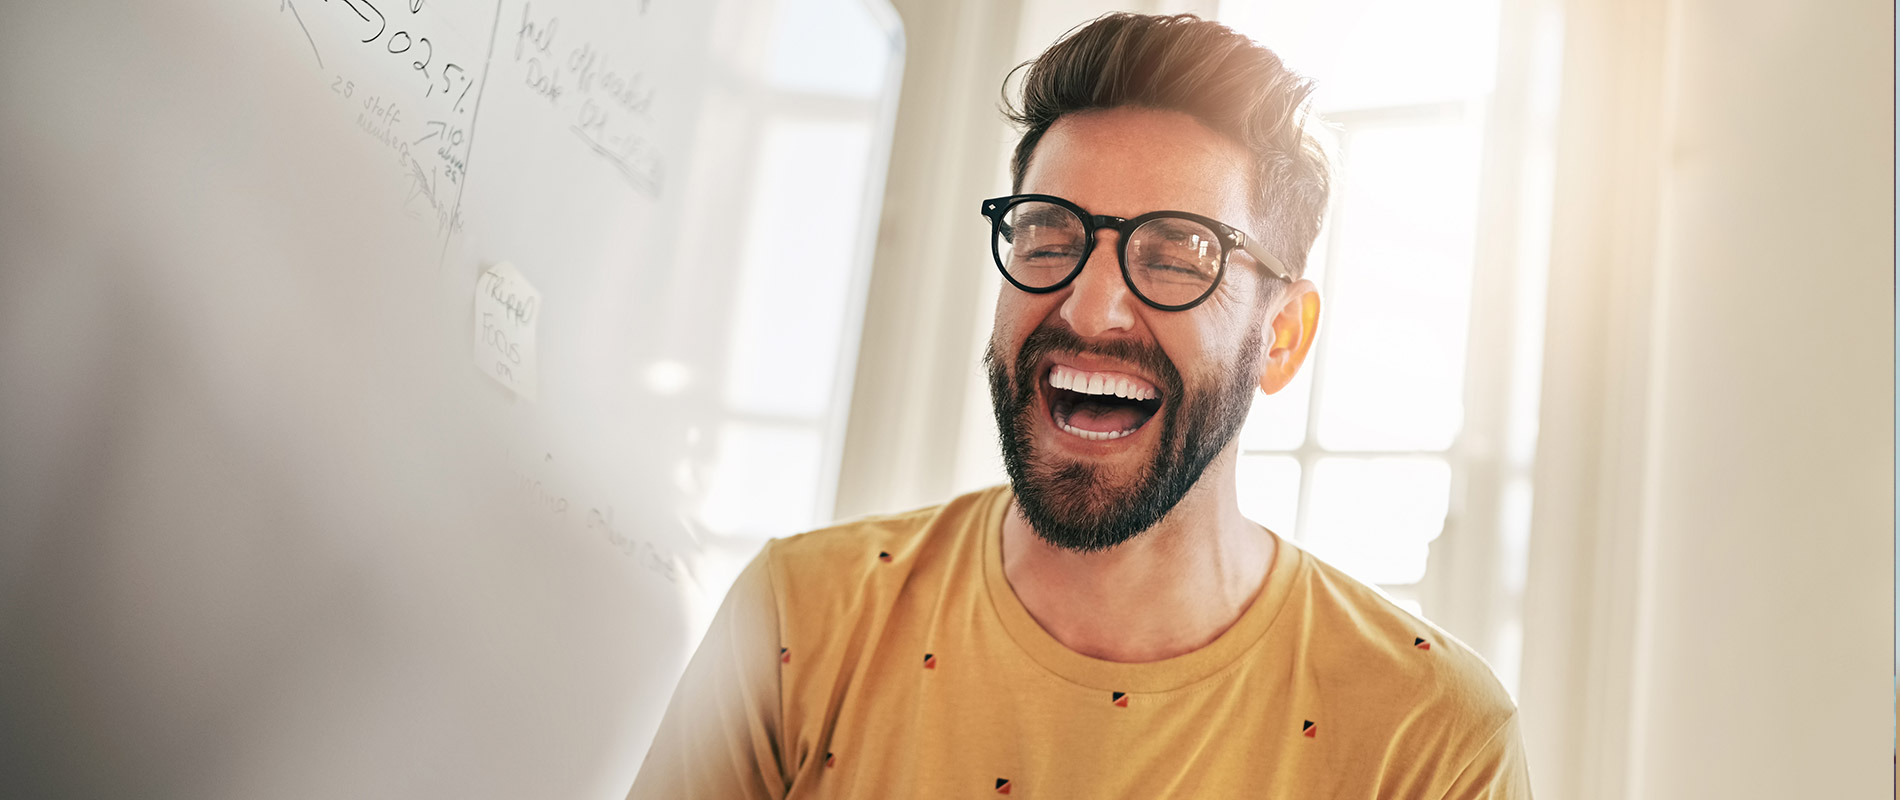 Schöne Zähne Hannover, Ästhetik unterstützt dentale Medizin